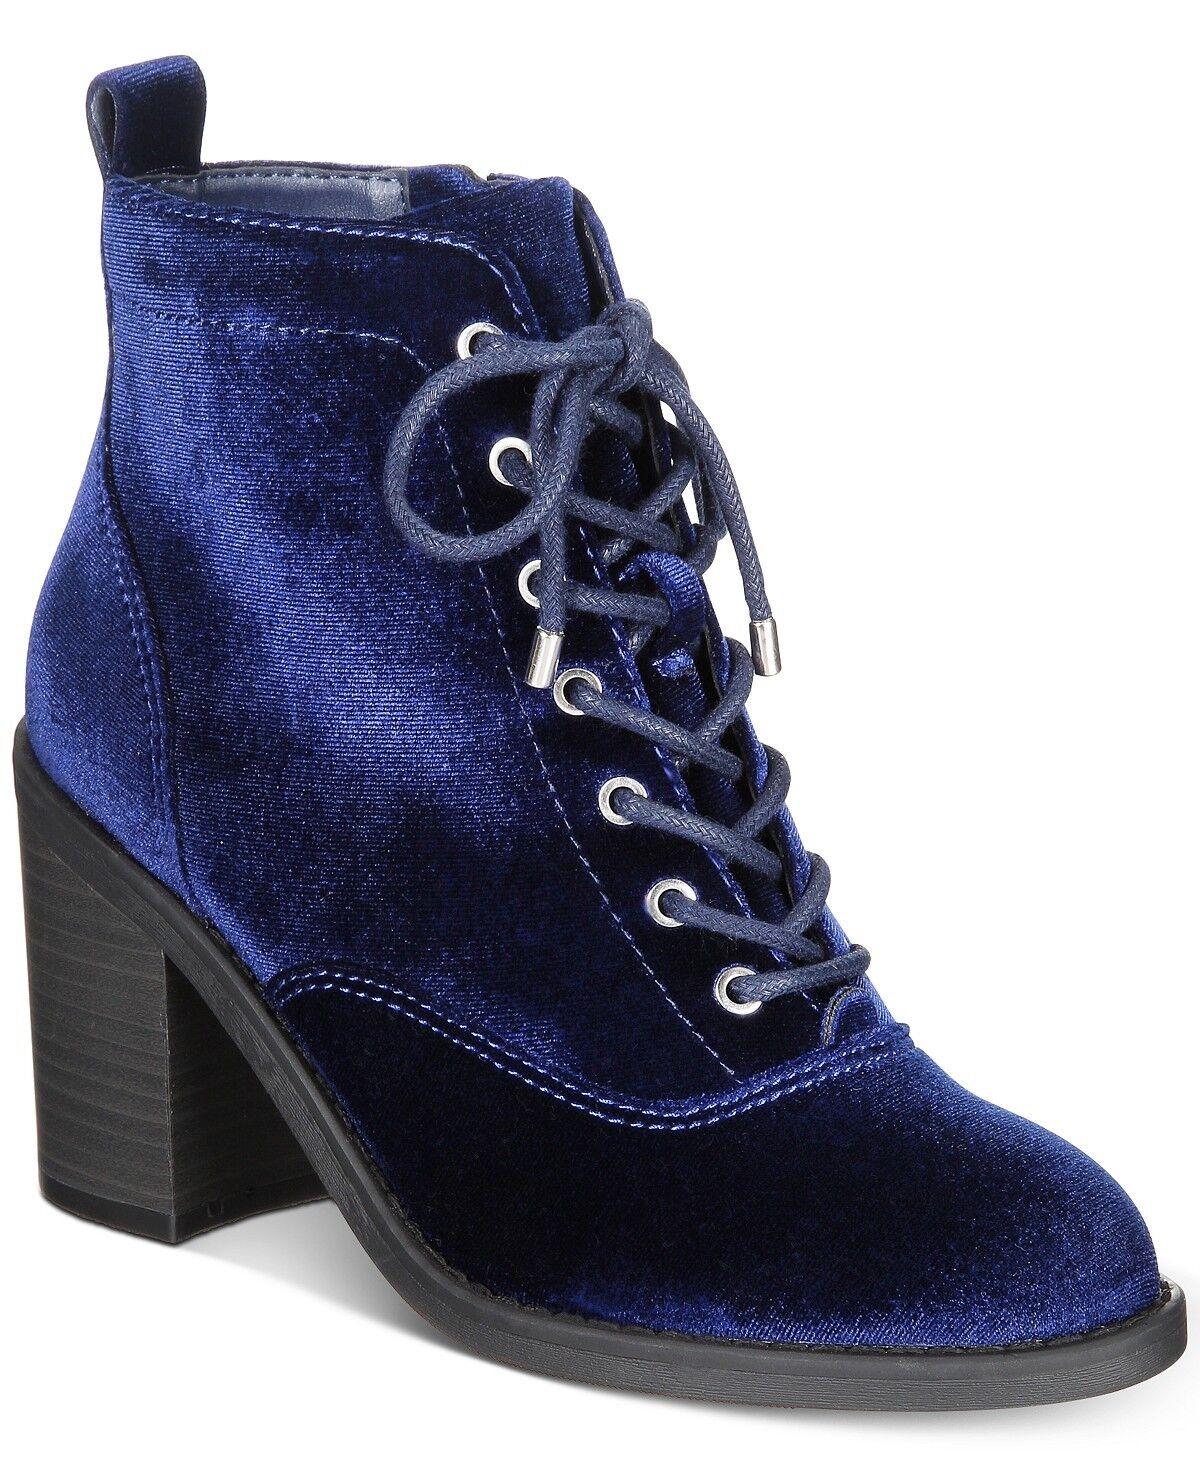 Material Girl femmes Landrey Lace Up démarrageies Navy bleu Taille 6.5 Brand New